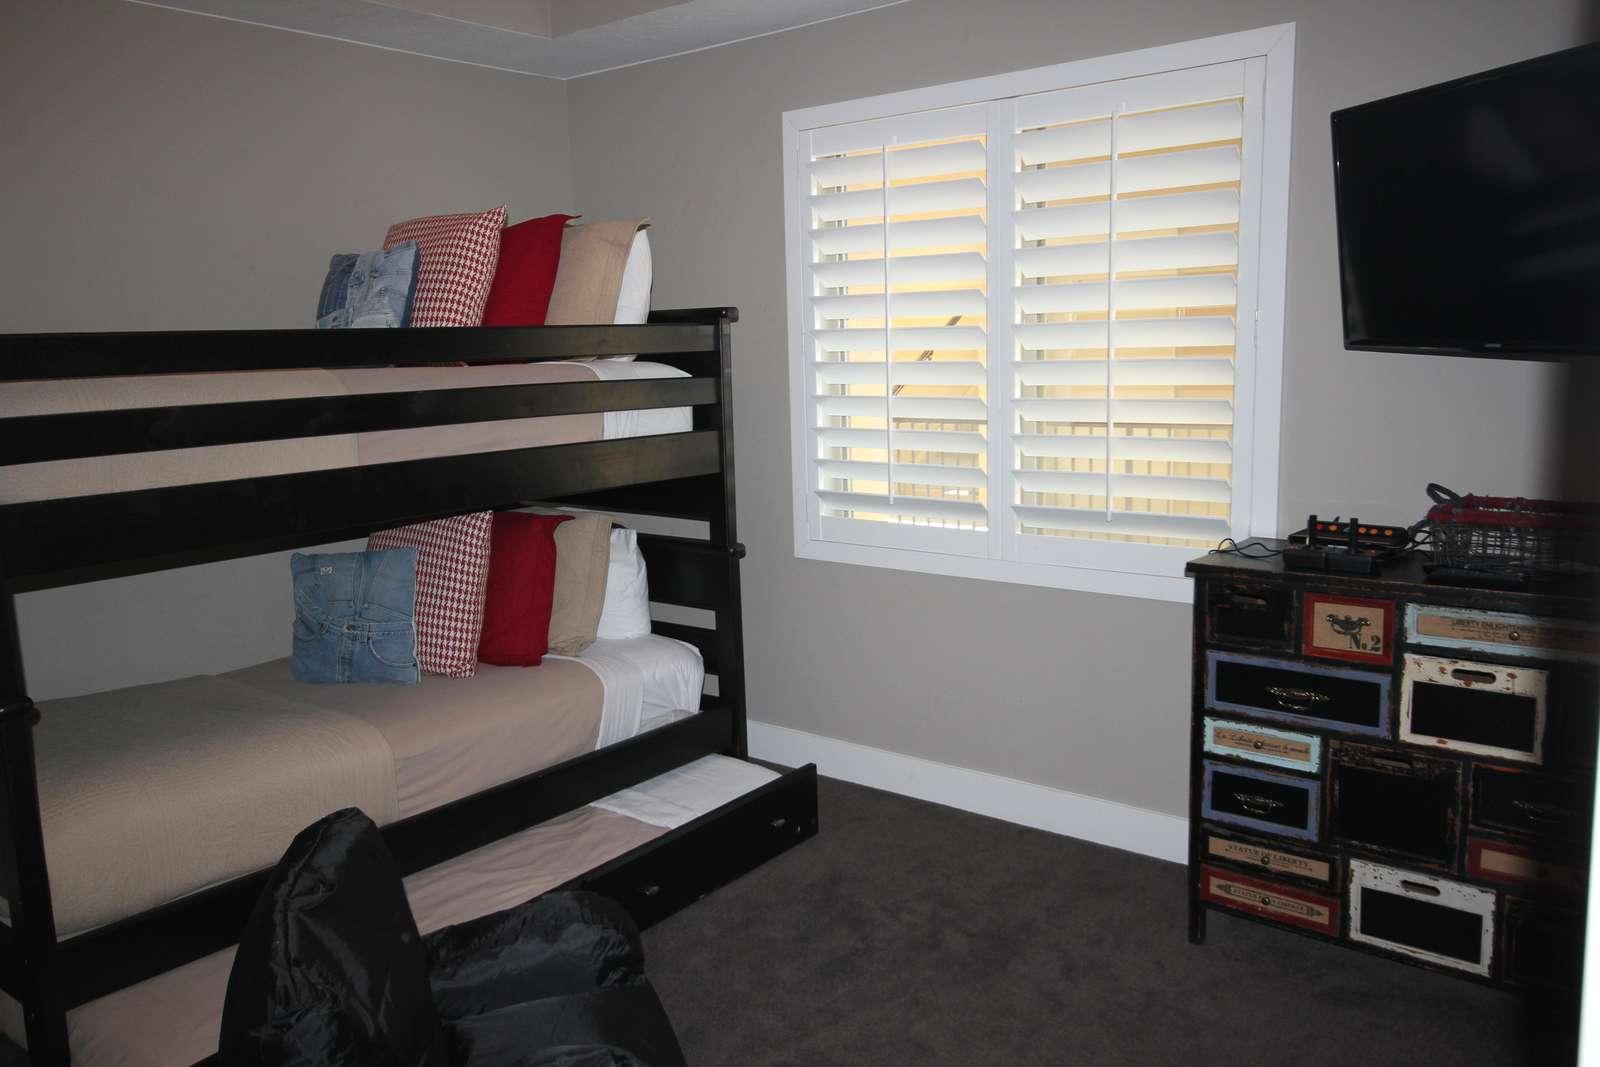 Bedroom 3 = 3 Twin Beds + Retro ATARI game area